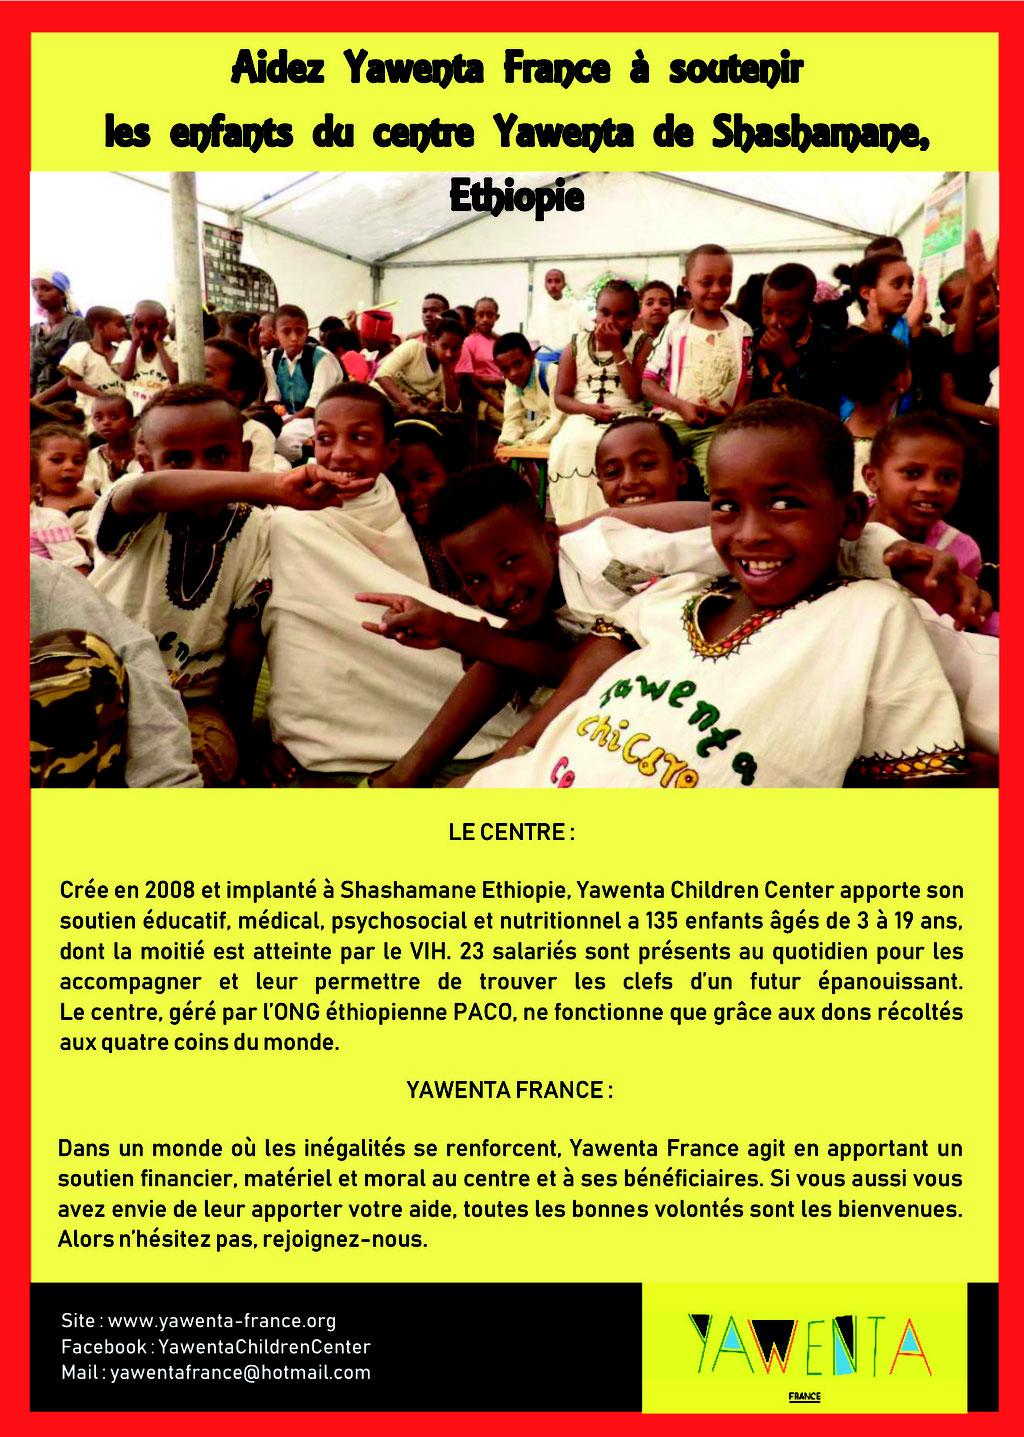 Mawuli-Ethiopie Association Yawenta Childrens Center Plateforme Commerce Textile Café Epices Ethiopiennes Artisanat Ethiopien Solidaire Equitable Made in Ethiopia Voyage Séjour Trek Vélo Bike Trekking Randonnée Road Trip en Ethiopie.